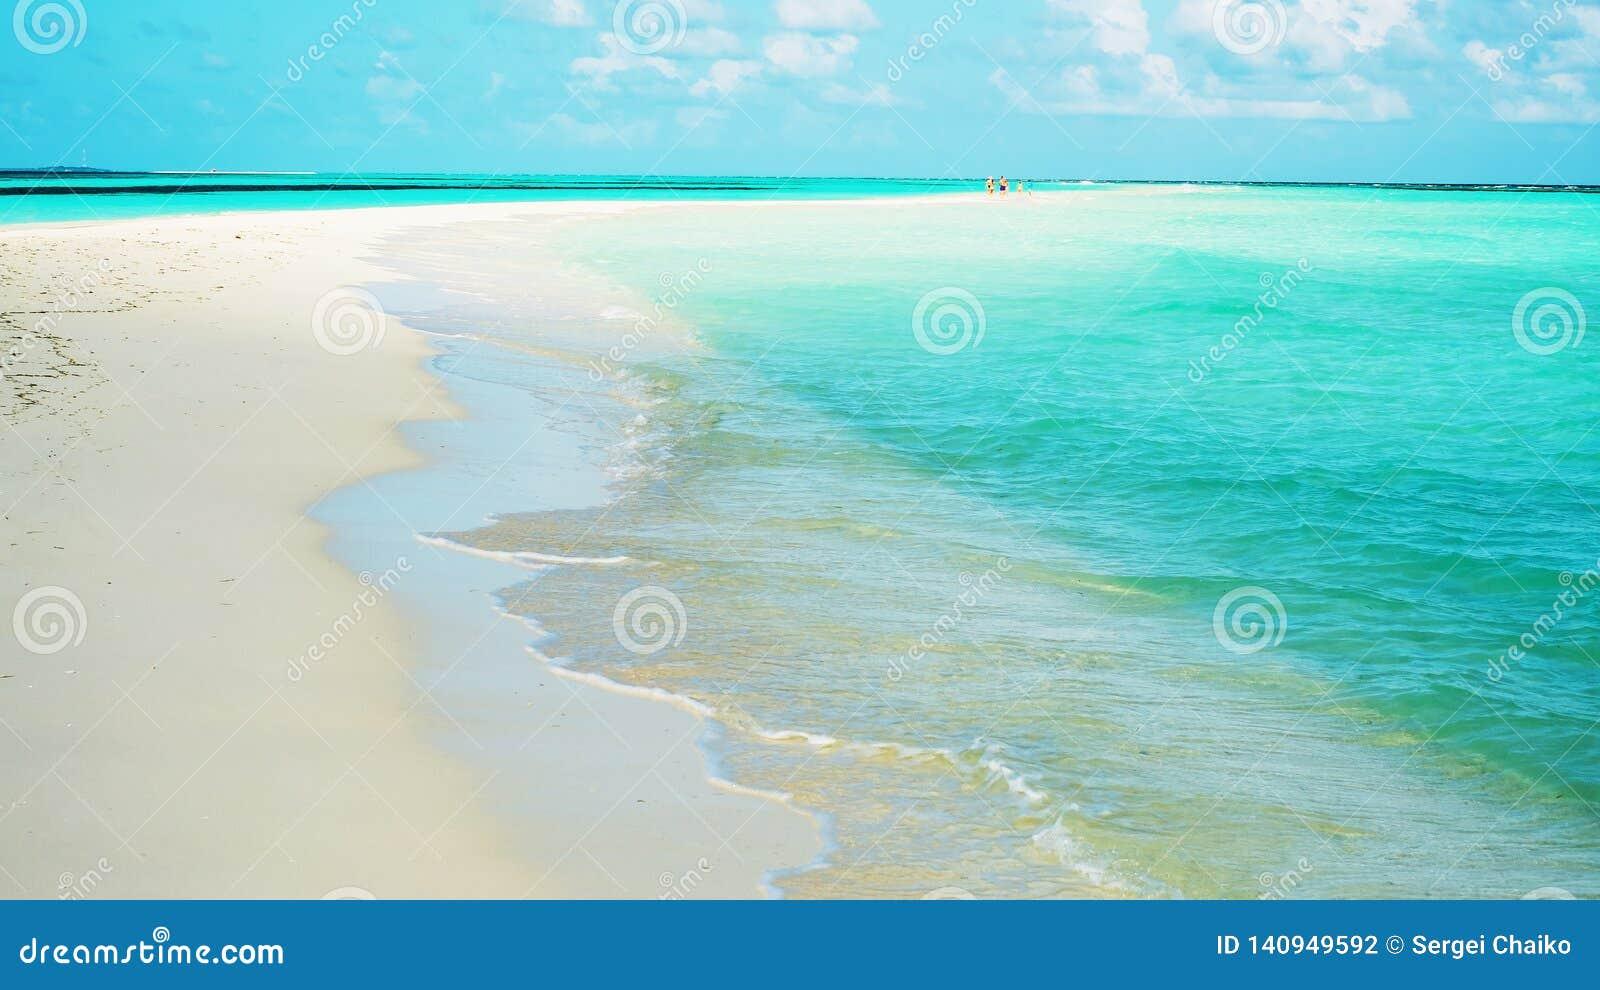 La barra de arena aparece durante la bajamar en la isla Lhaviyani, Maldivas